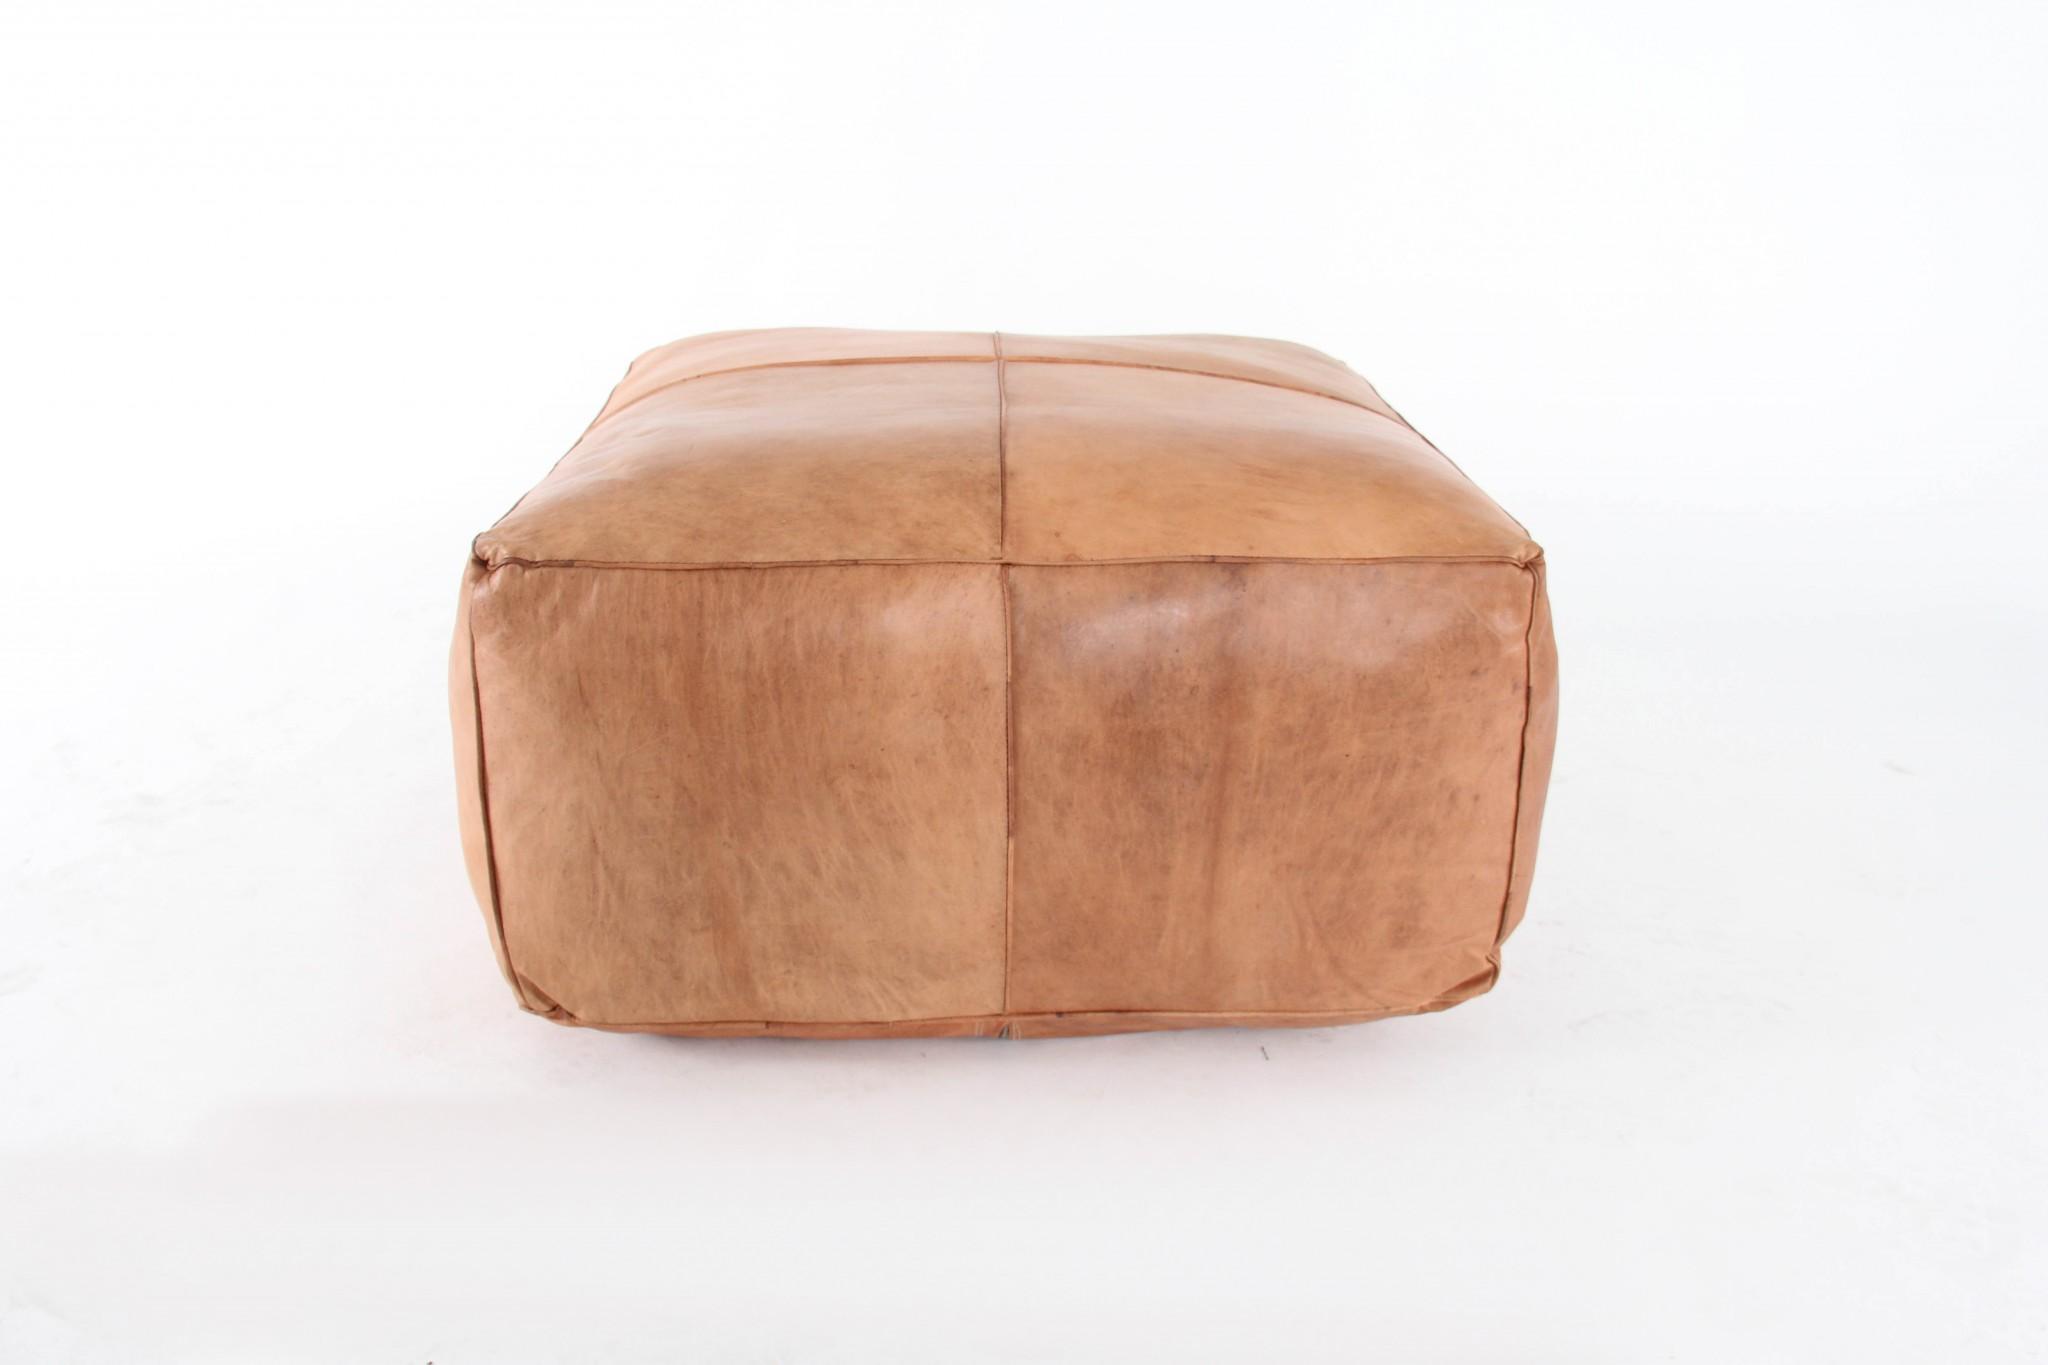 Pleasant Big Effin Leather Ottoman Patina Creativecarmelina Interior Chair Design Creativecarmelinacom